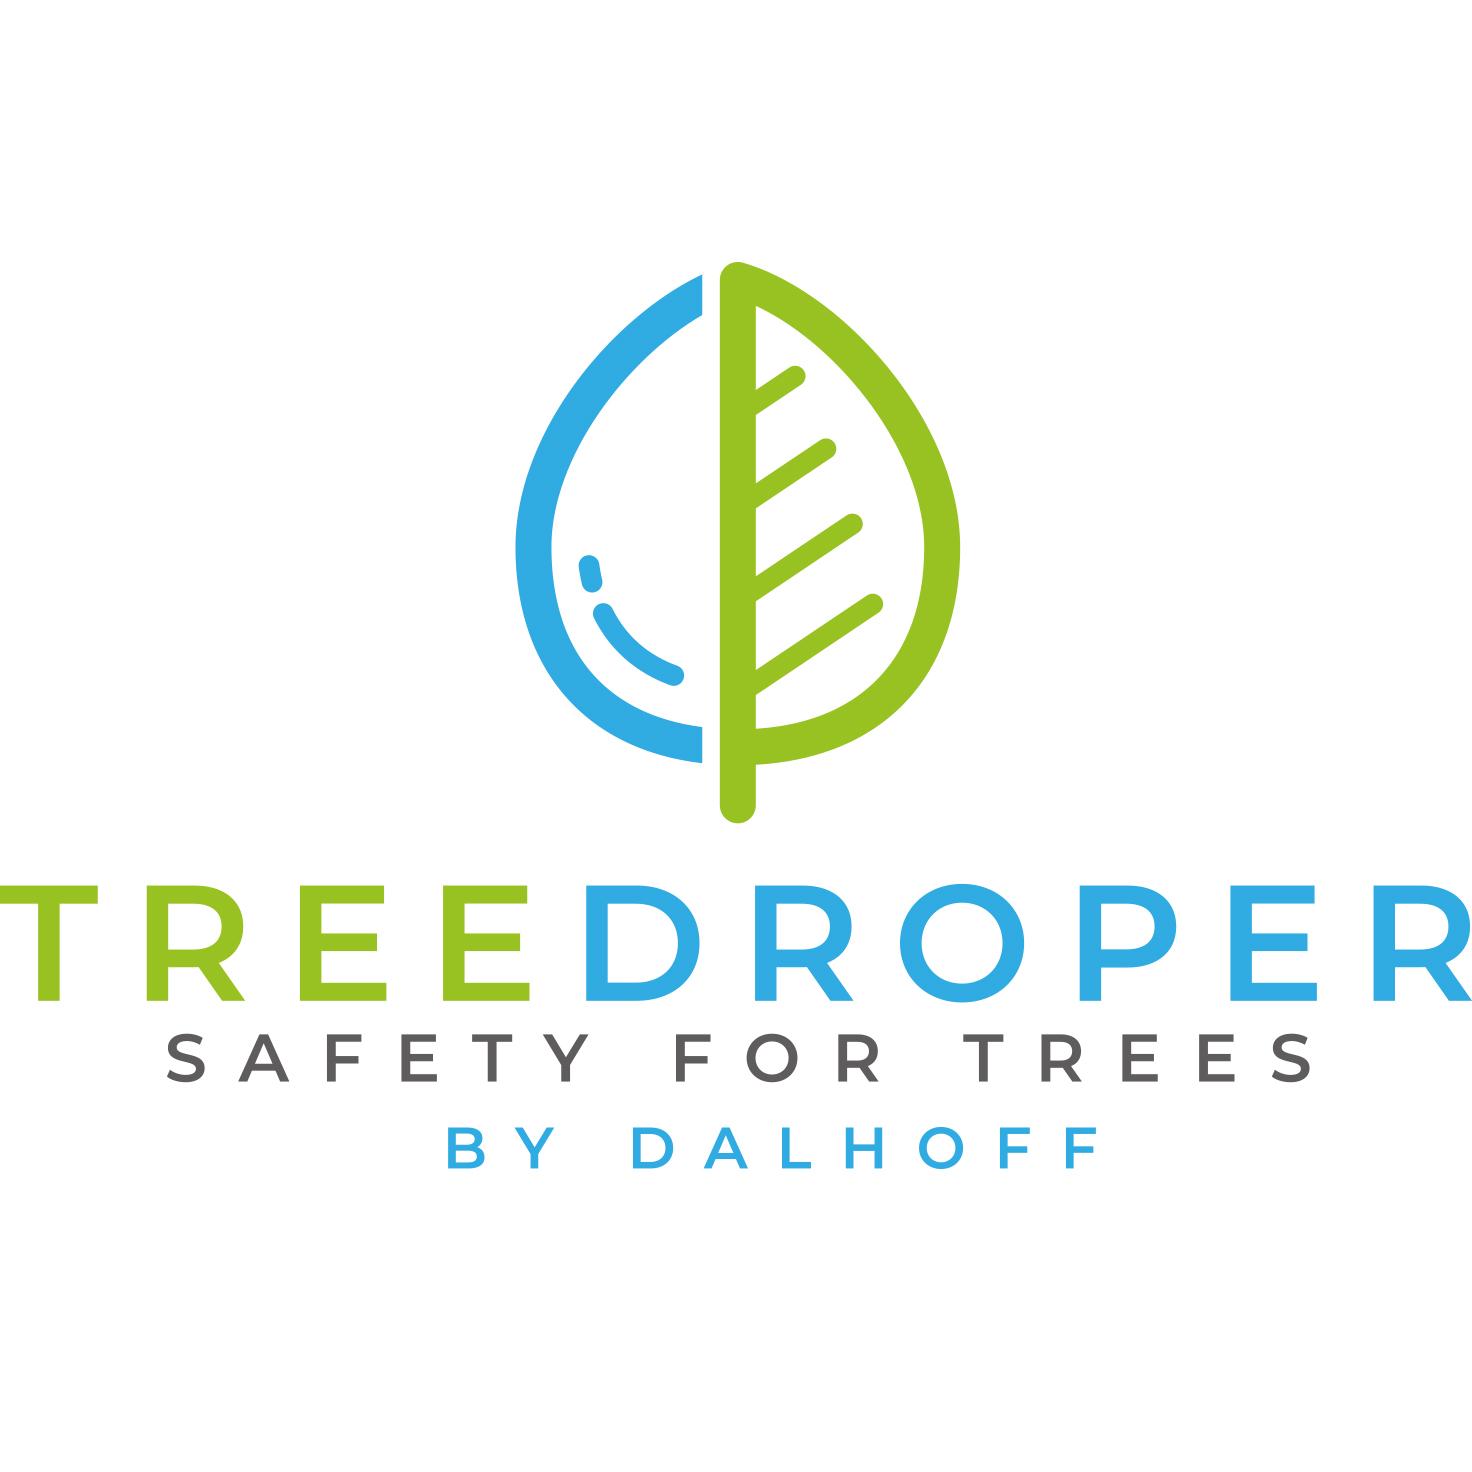 Original Treedroper